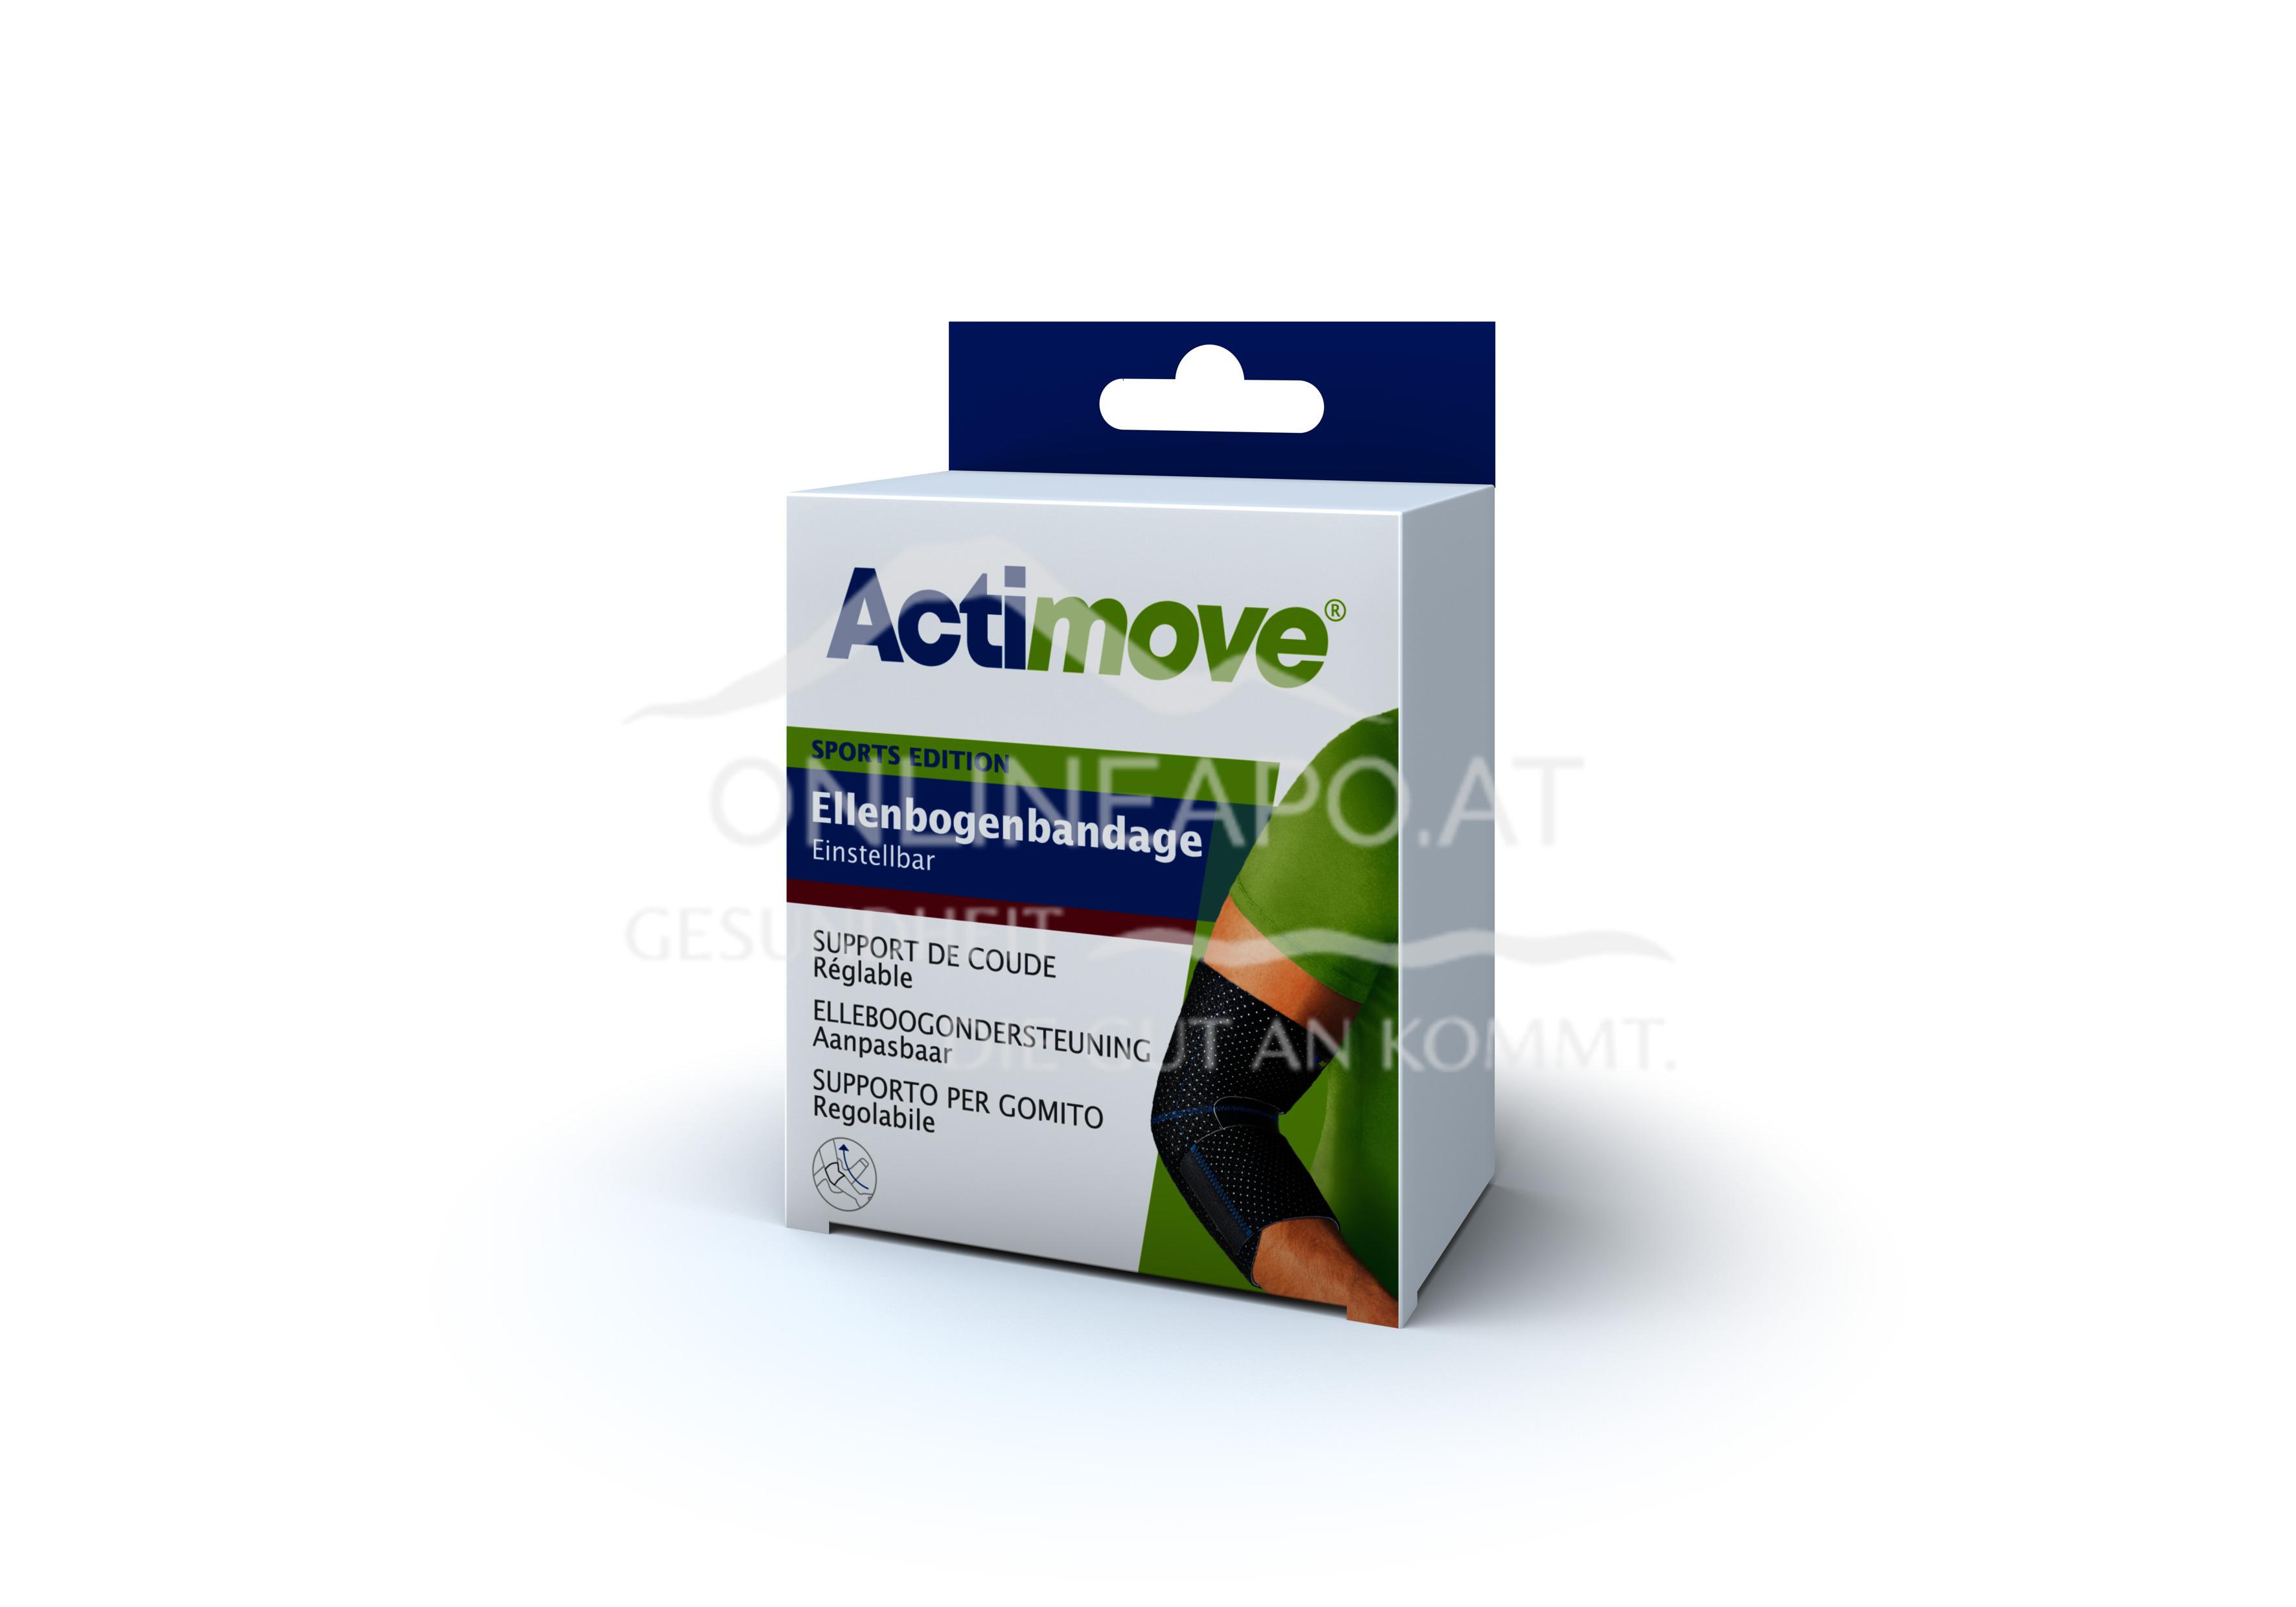 Actimove® Sport Edition Ellenbogenbandage Einstellbar